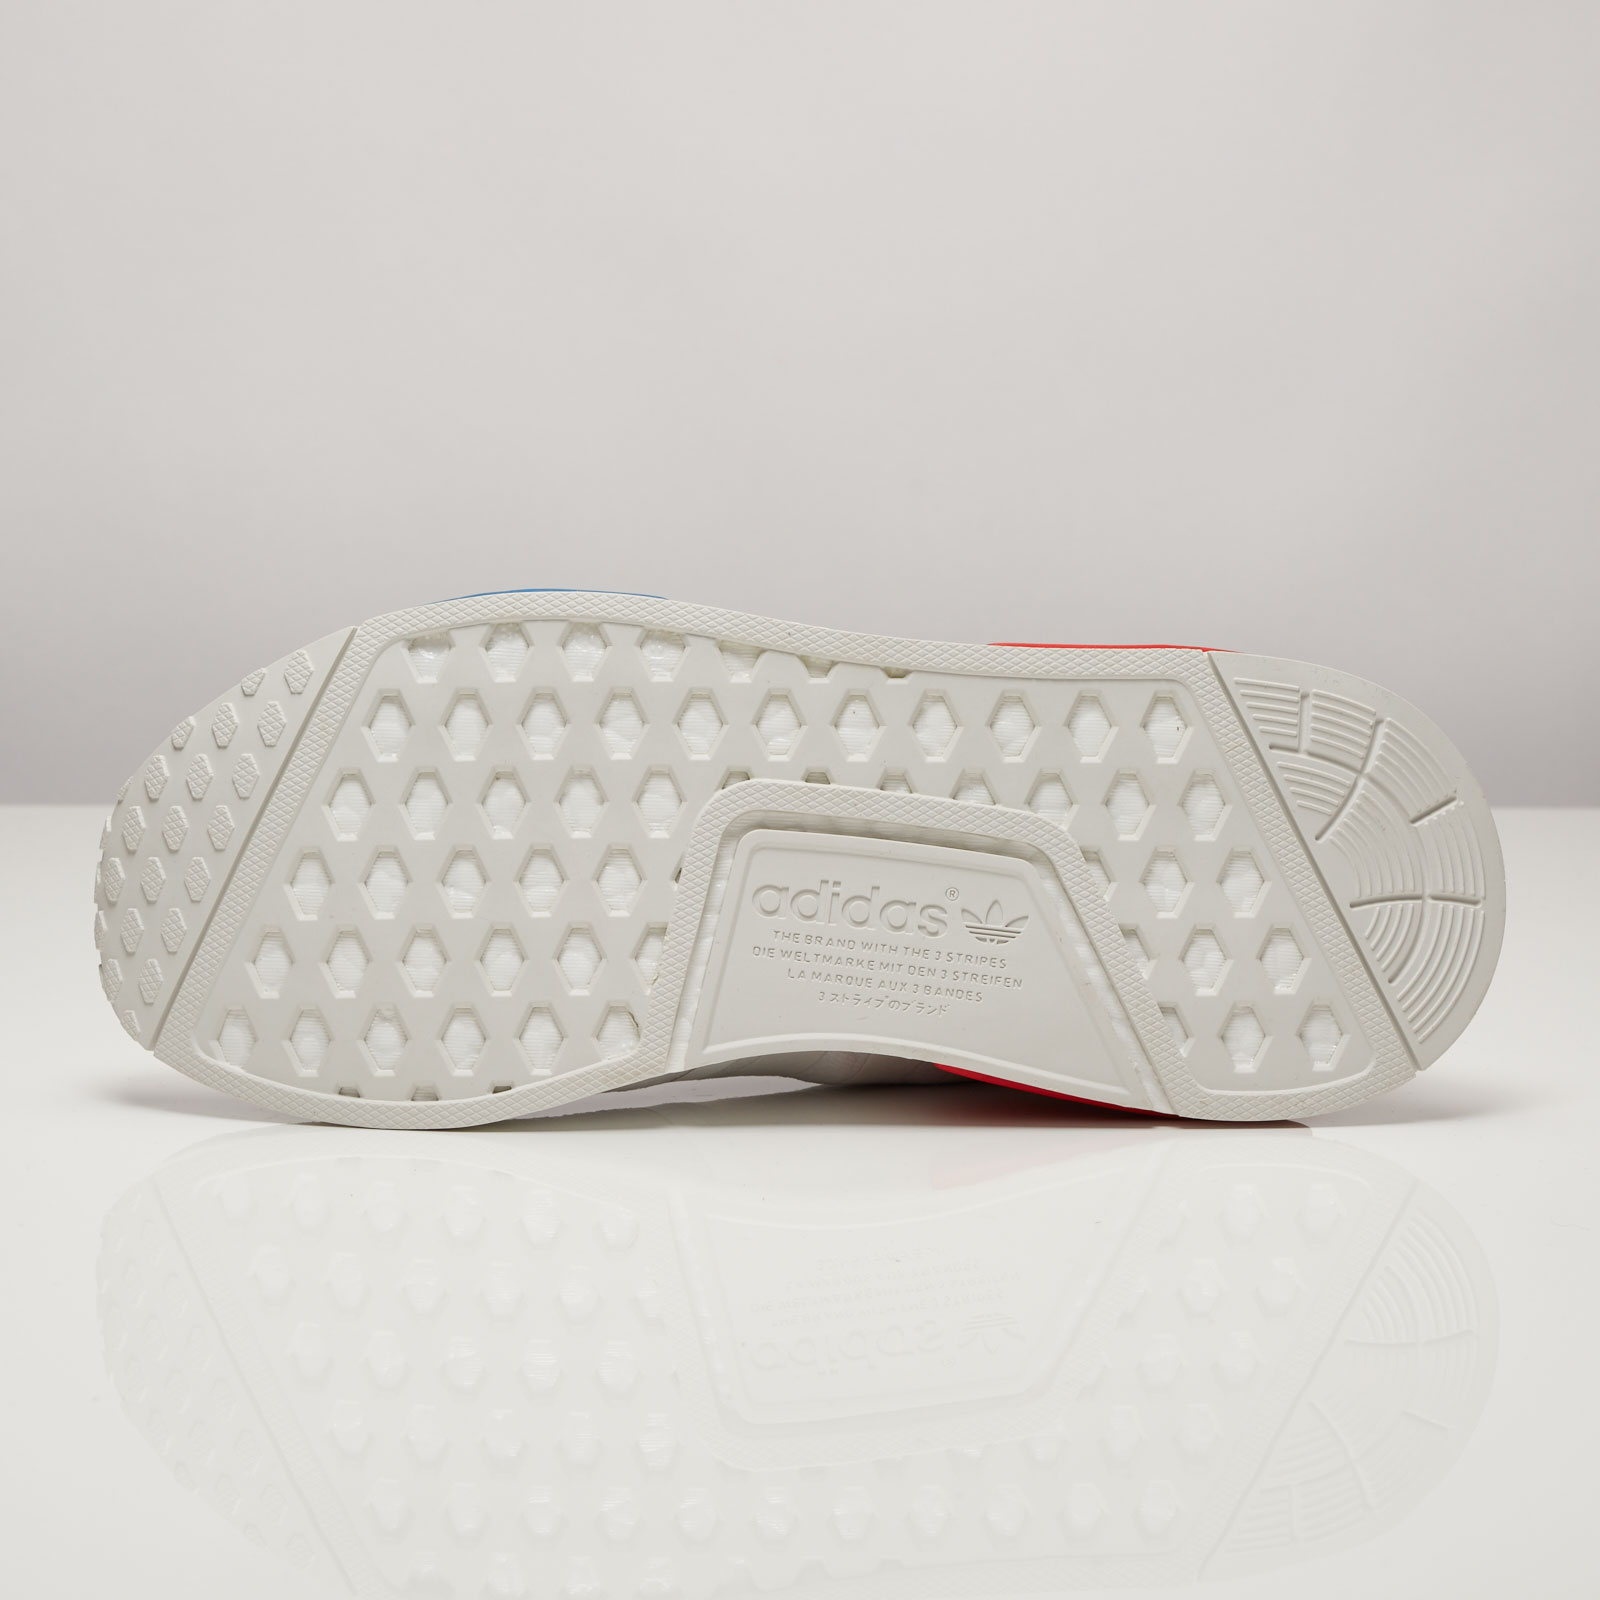 41b2d53fa467c adidas NMD R1 PK - S79482 - Sneakersnstuff